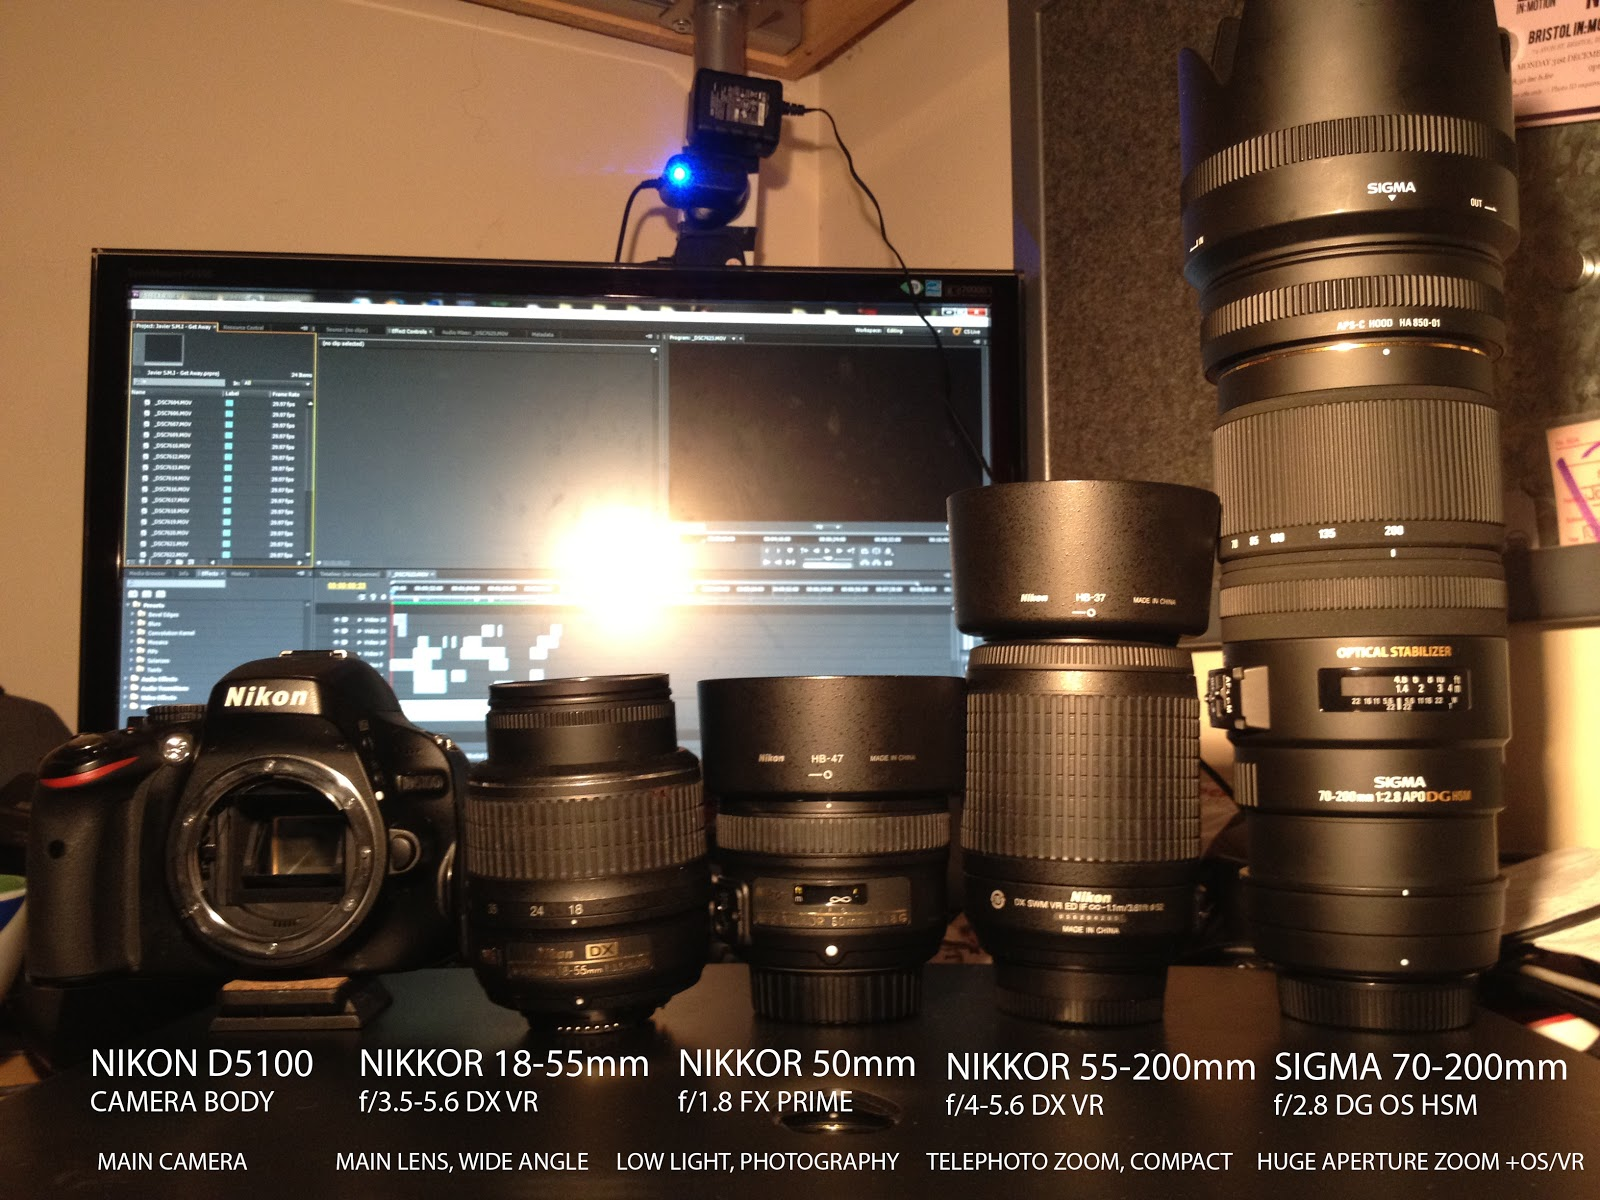 lens basics understanding camera lenses - HD1600×1200